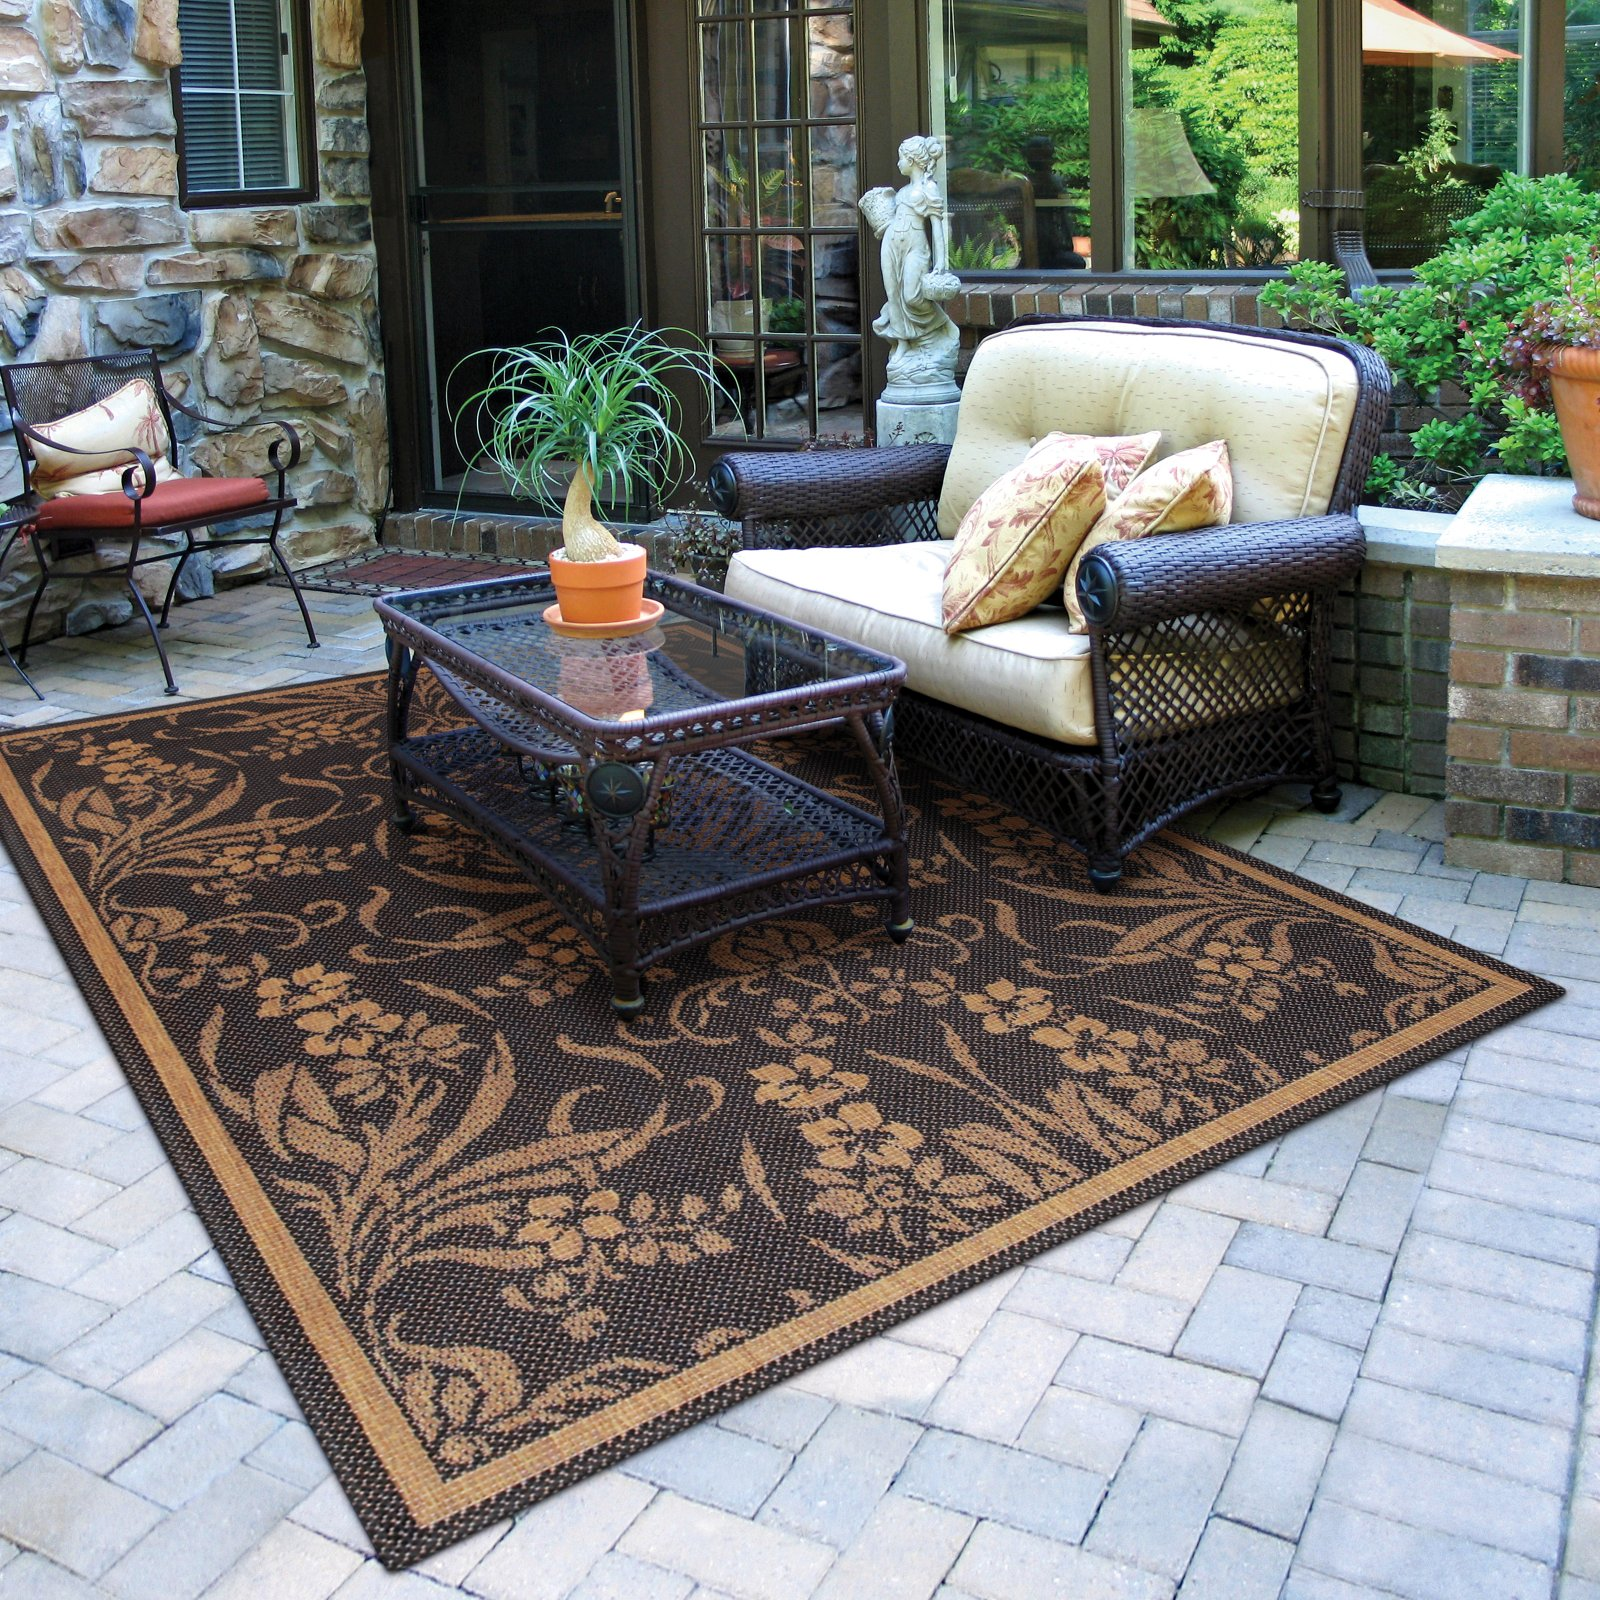 patio rugs nice outdoor patio rug patio decor plan outdoor rugs for patios enter JUXTCBT